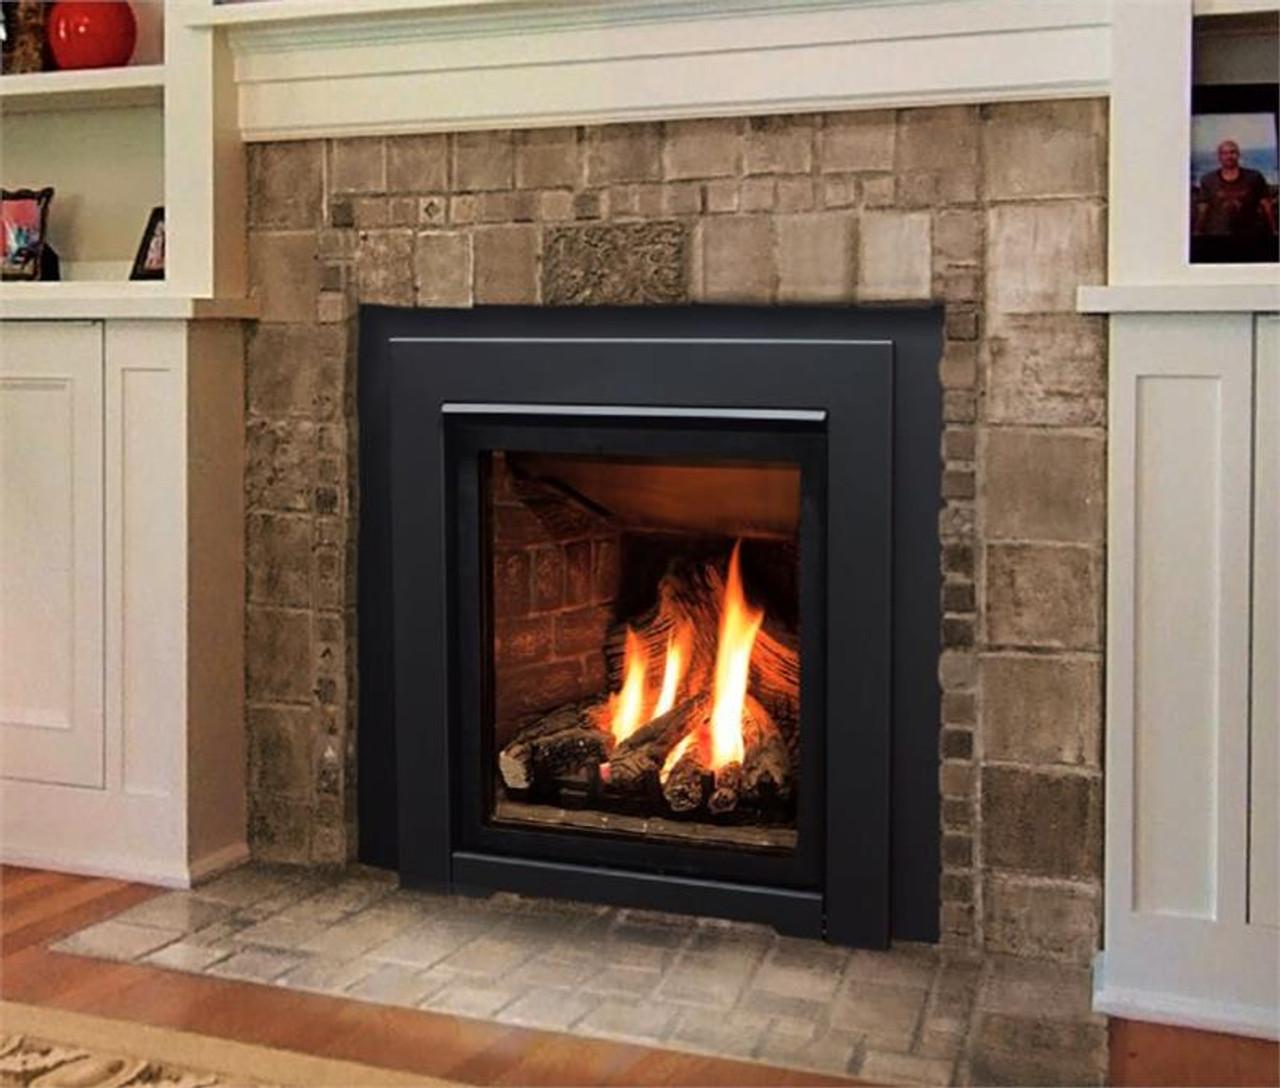 Pleasant Enviro Q1 Gas Fireplace Fireplace Insert Download Free Architecture Designs Scobabritishbridgeorg